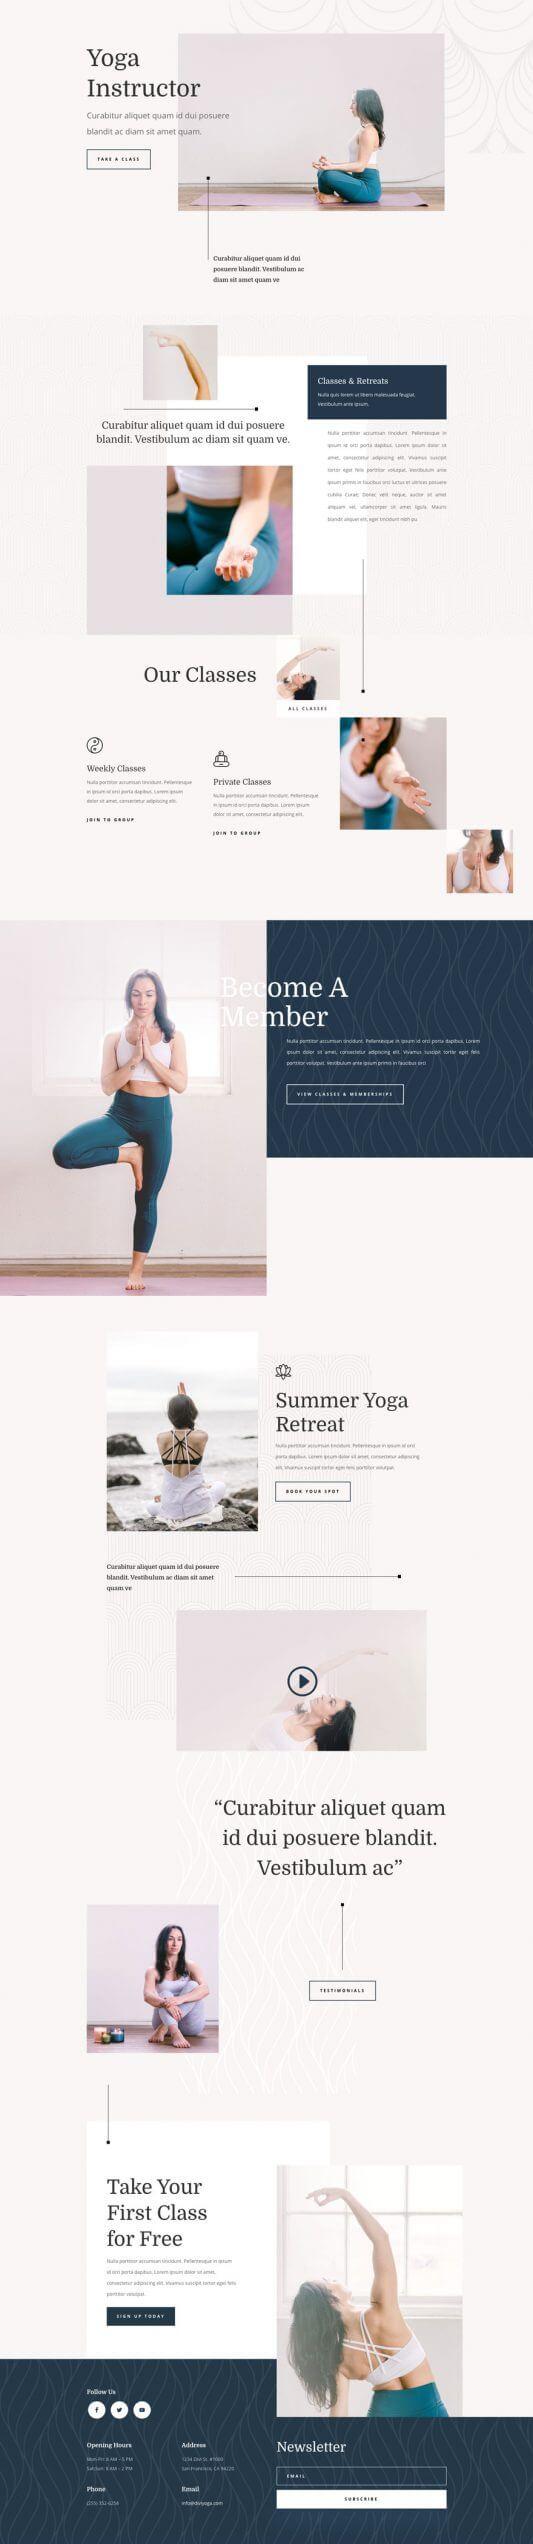 Layout Divi para Instructores de Yoga